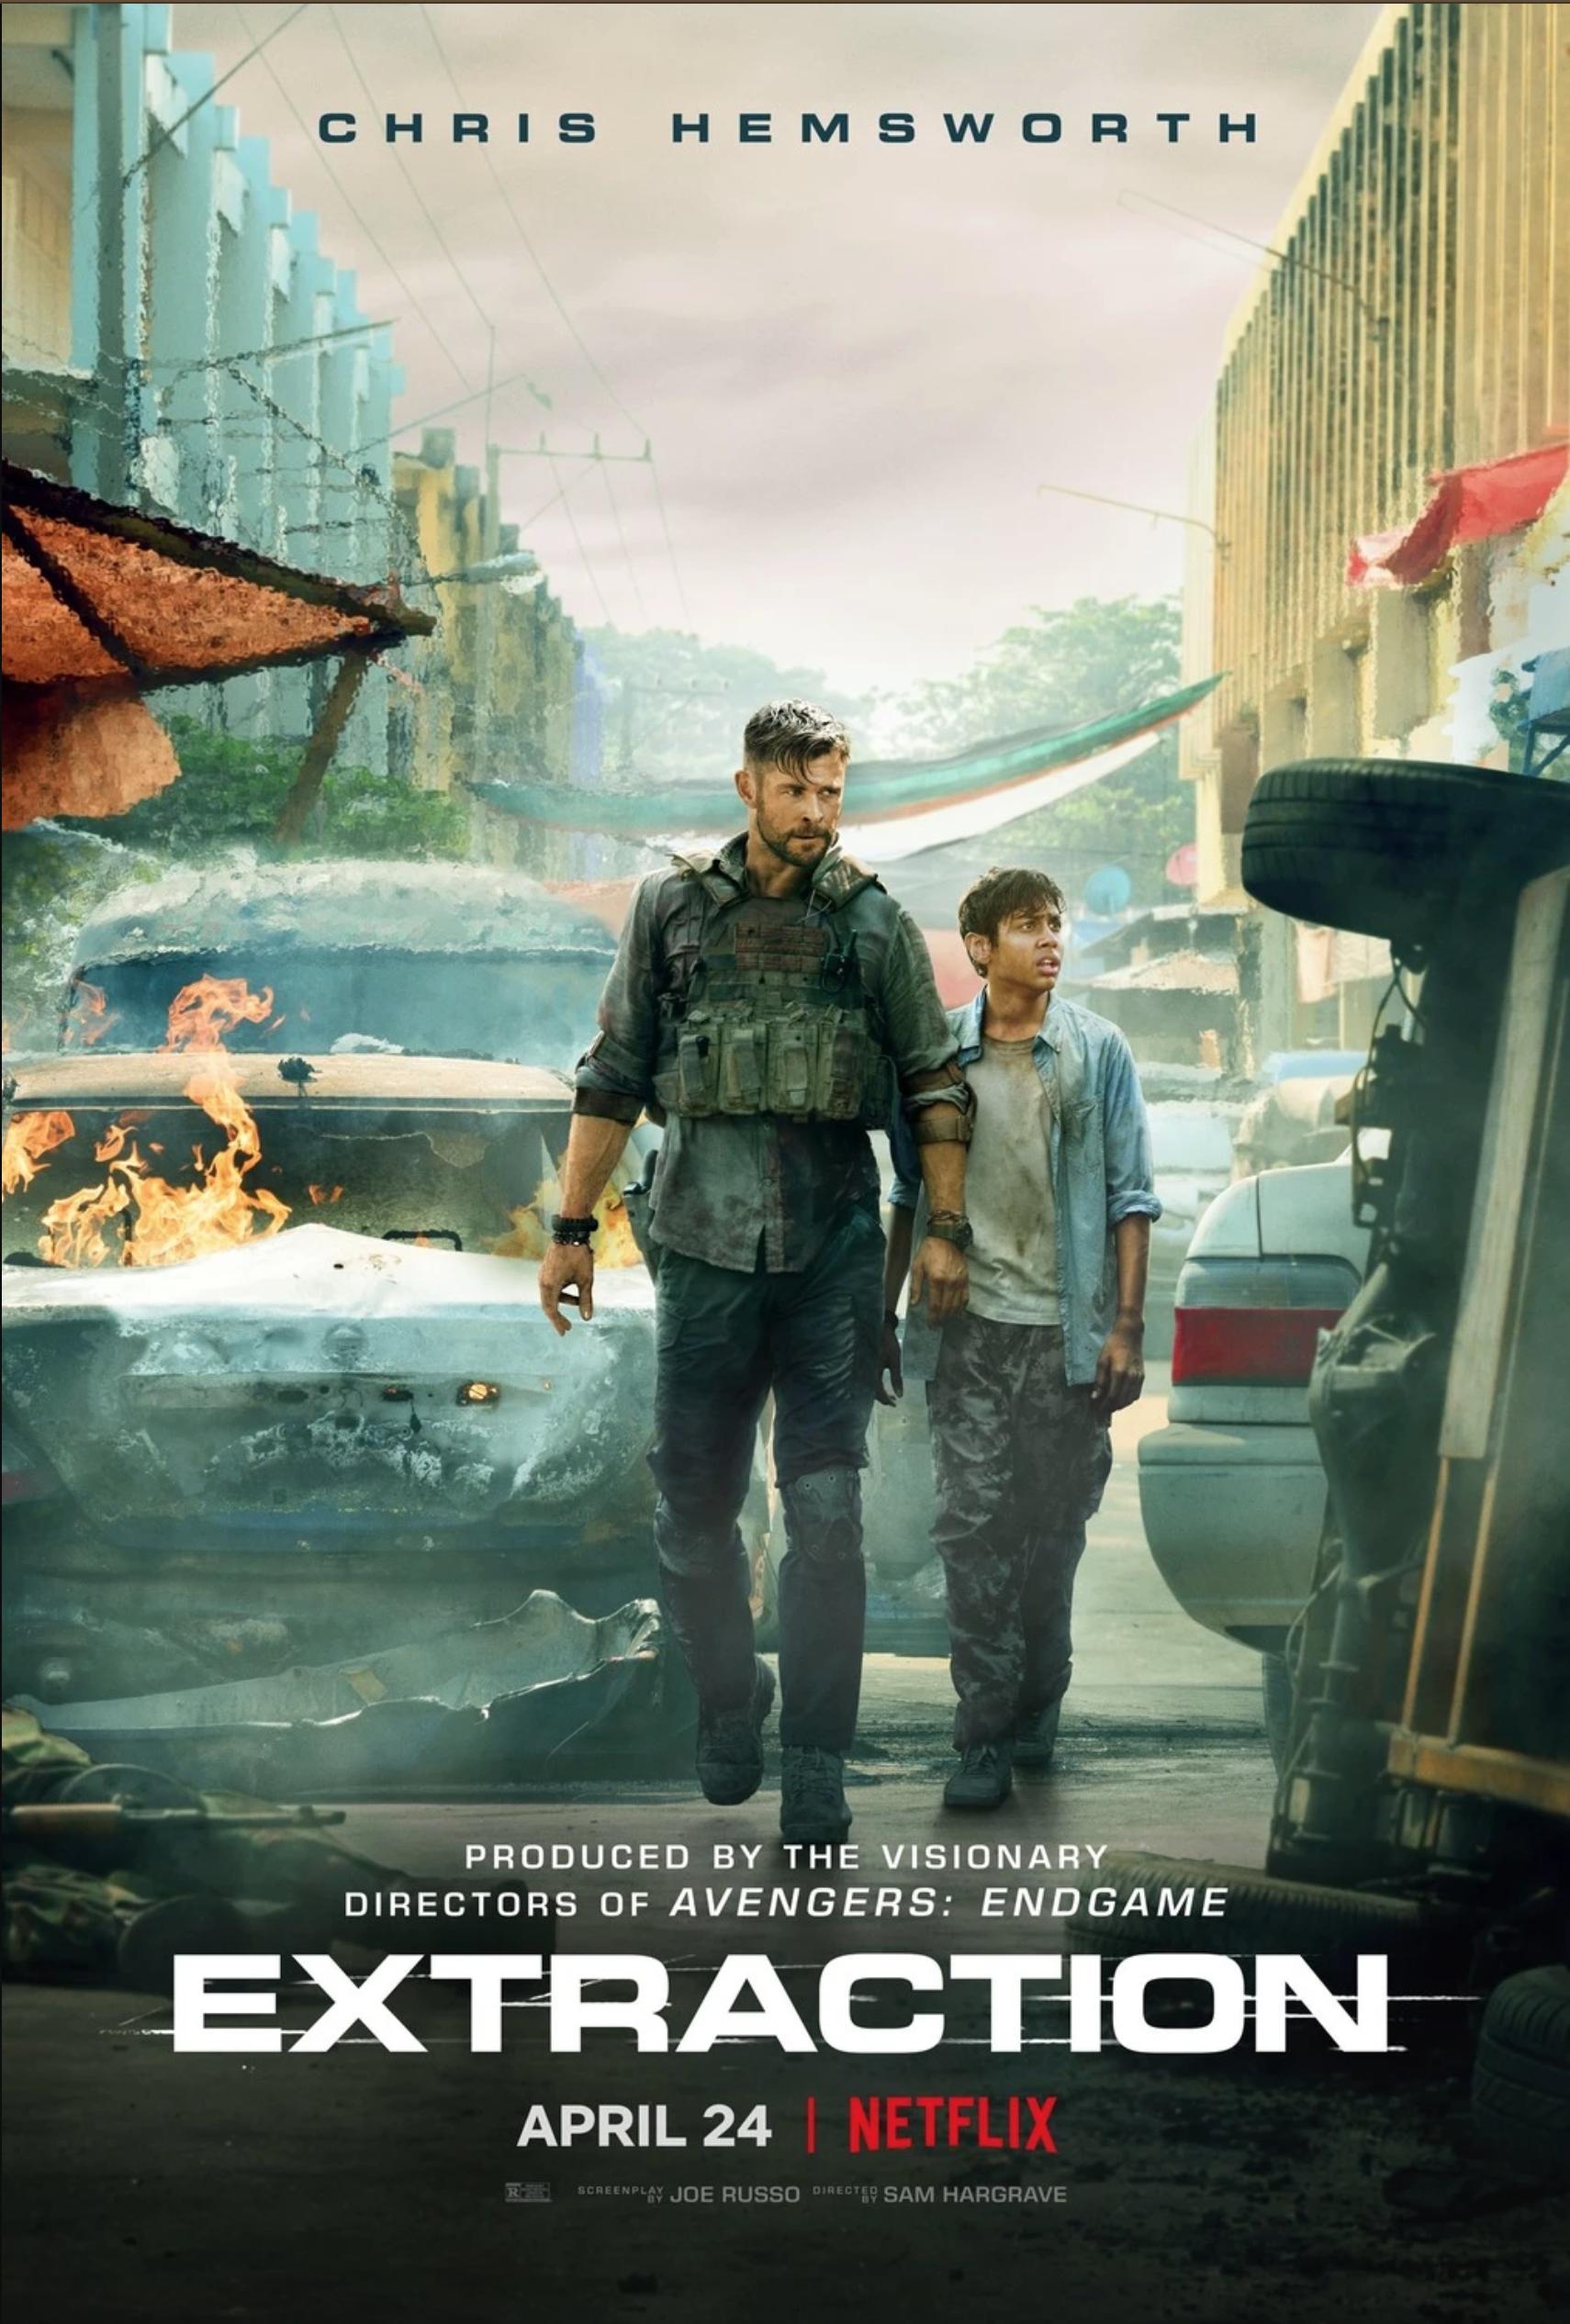 Tyler Rake Extraction Sam Hargrave 2020 Films Complets Film Netflix A Voir Meilleur Film Action